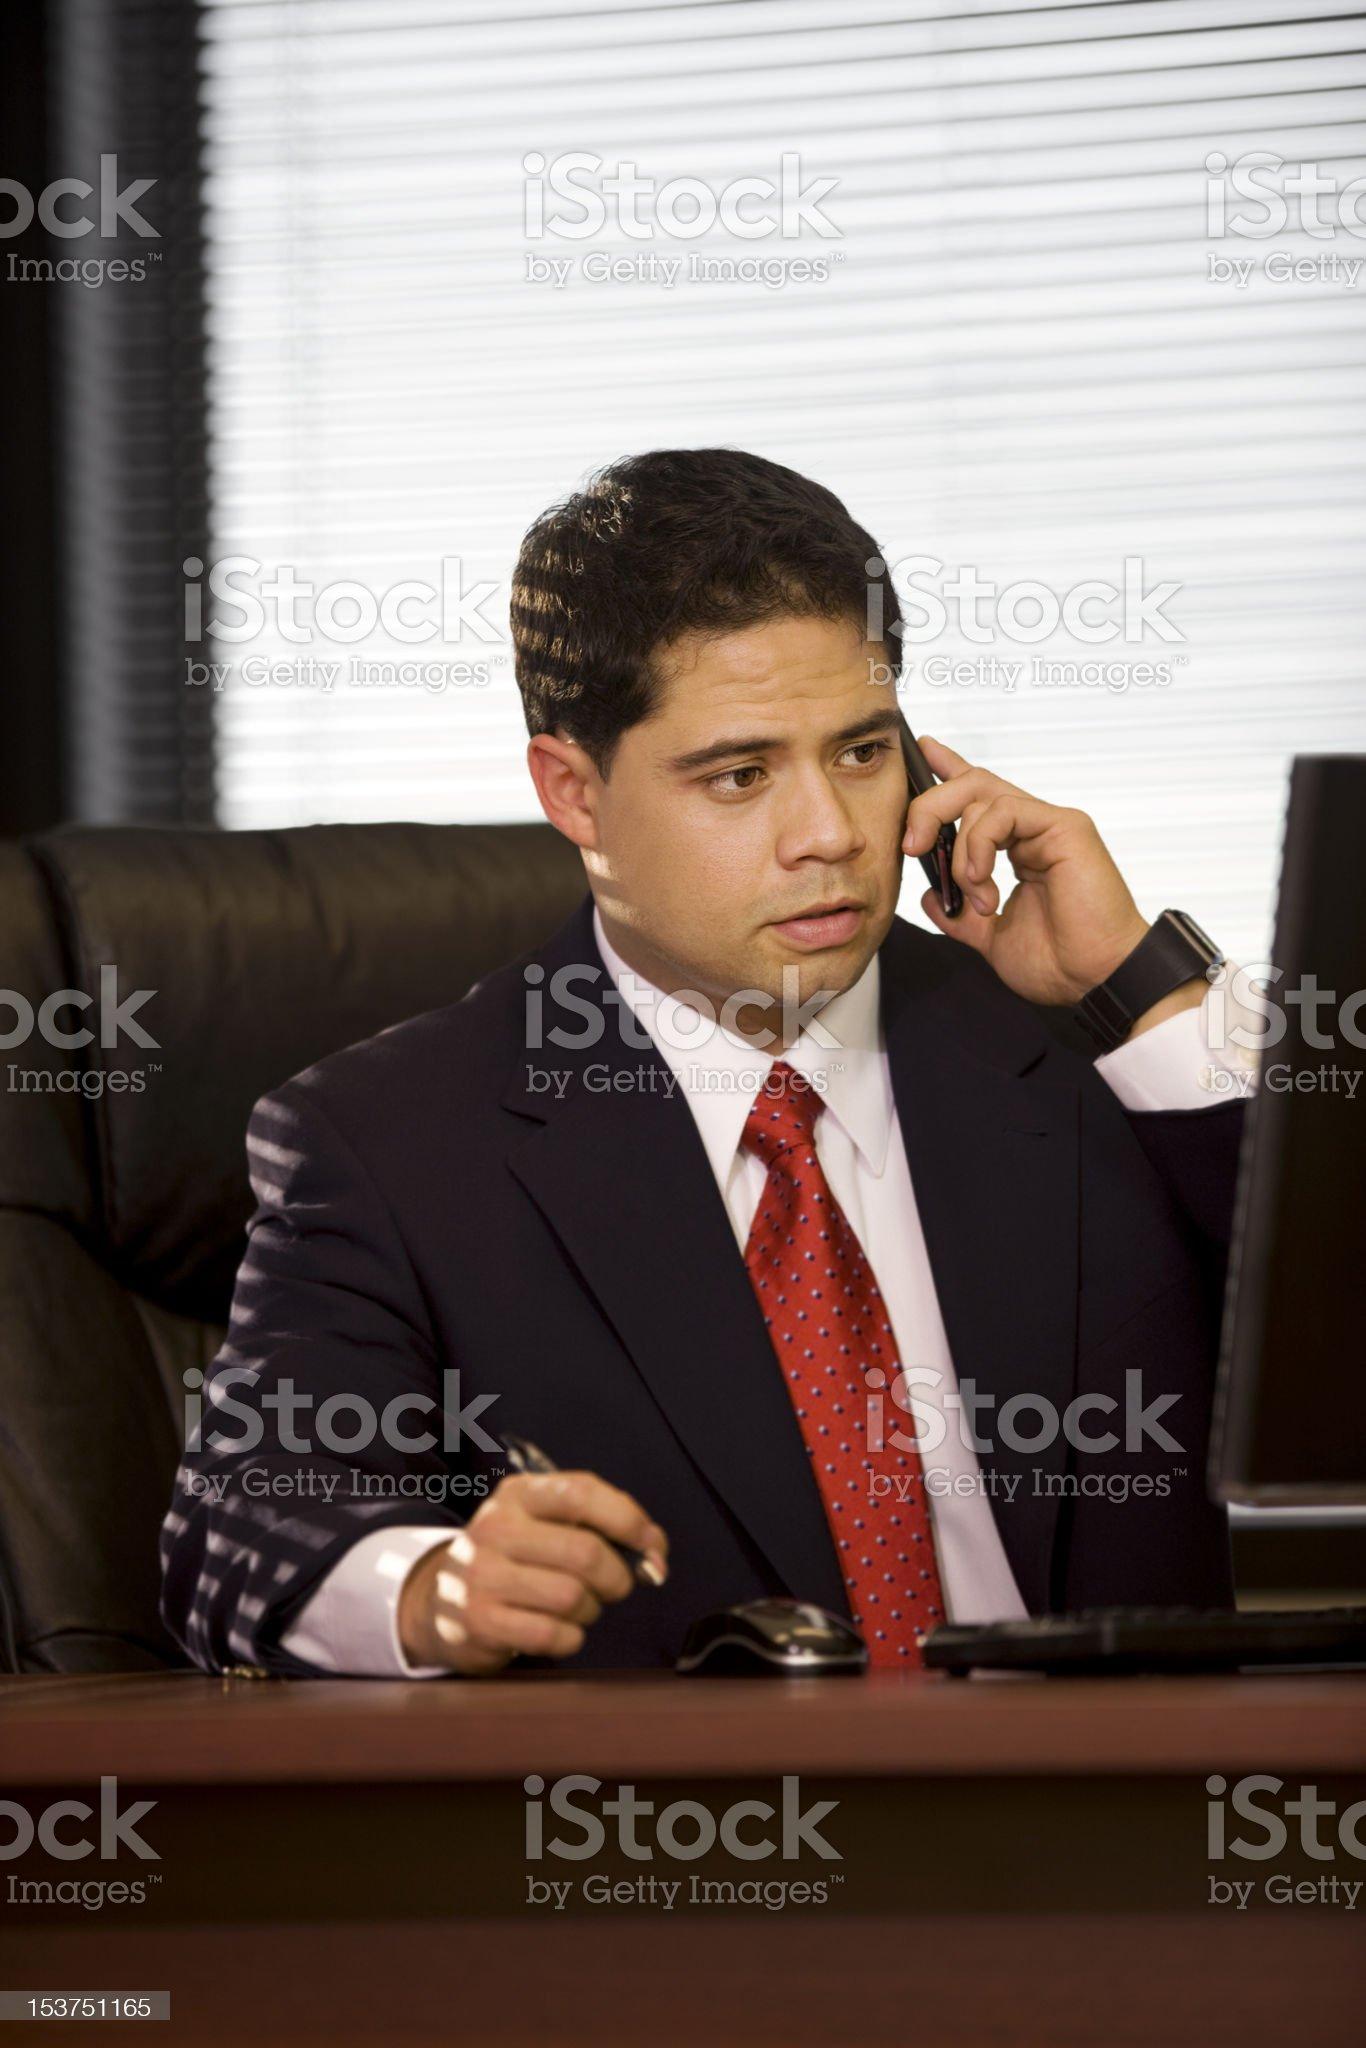 Hispanic Business Man on Cellphone royalty-free stock photo